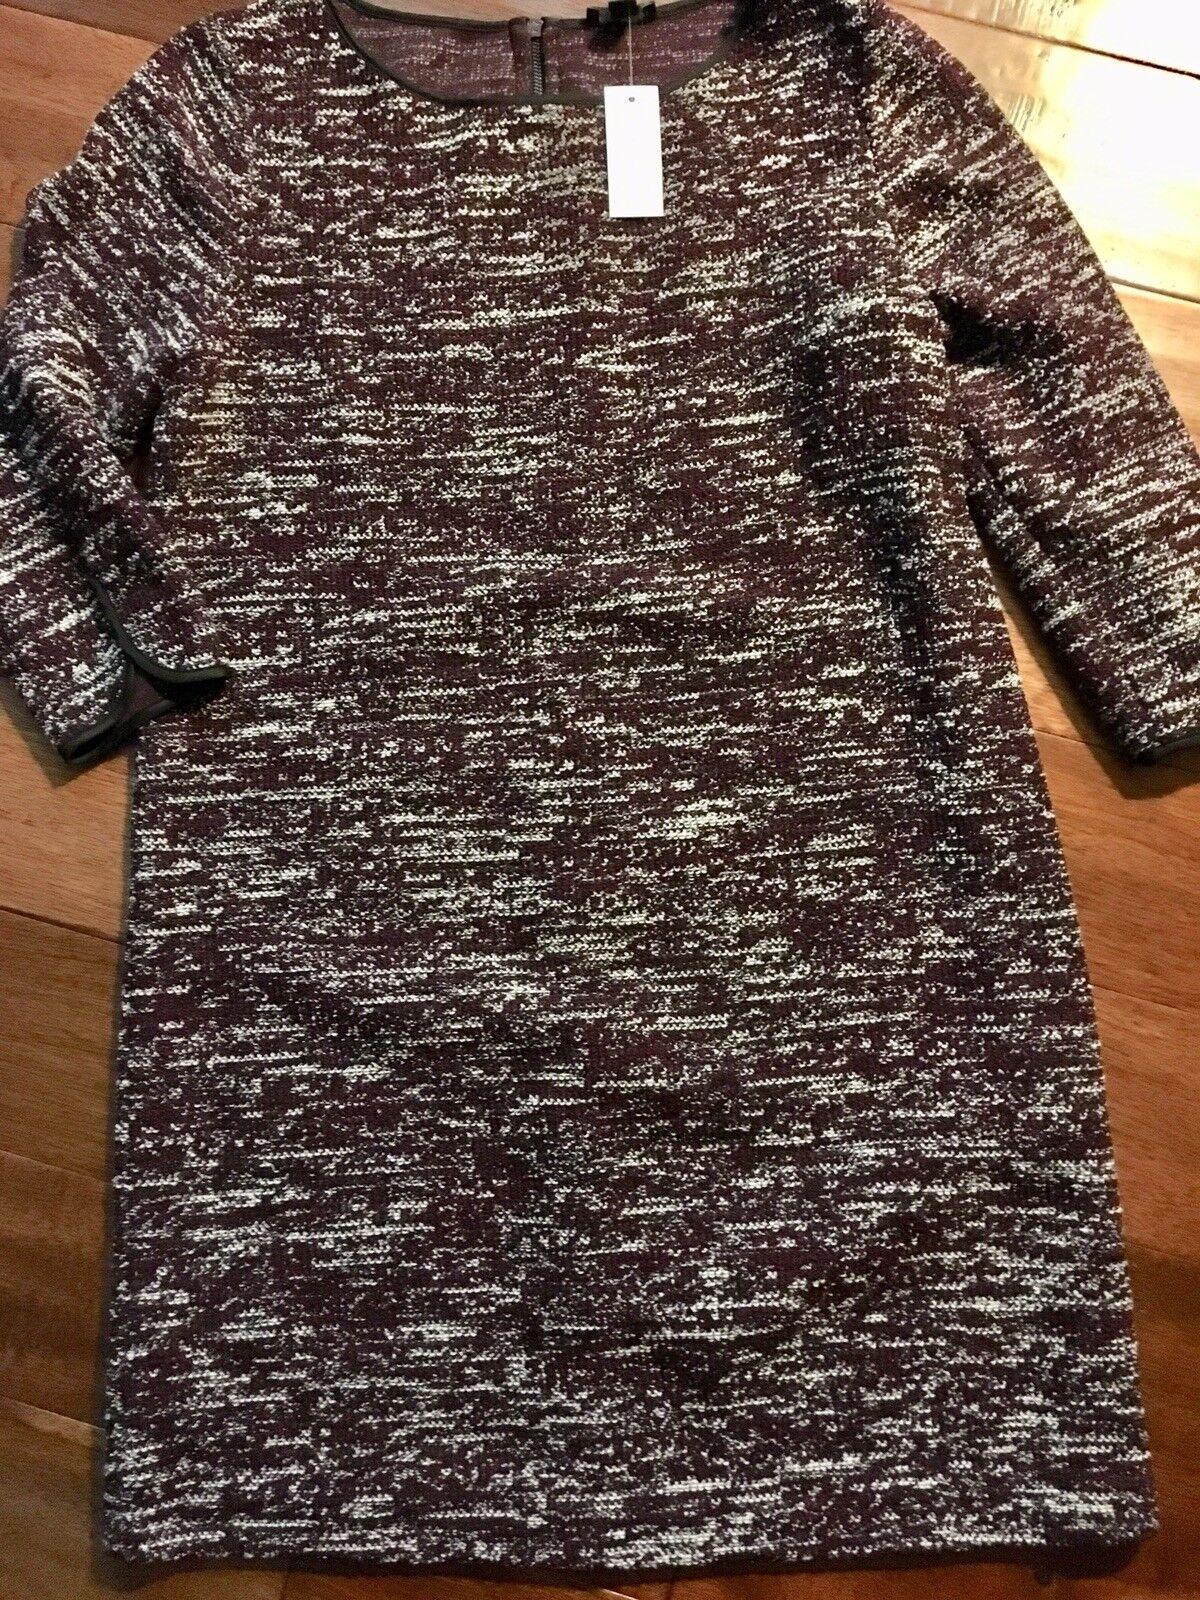 8f1eb58485e0 Ann Taylor Burgundy Tweed Knit 16 NWT Shift Dress nqxoqz4732-Dresses ...